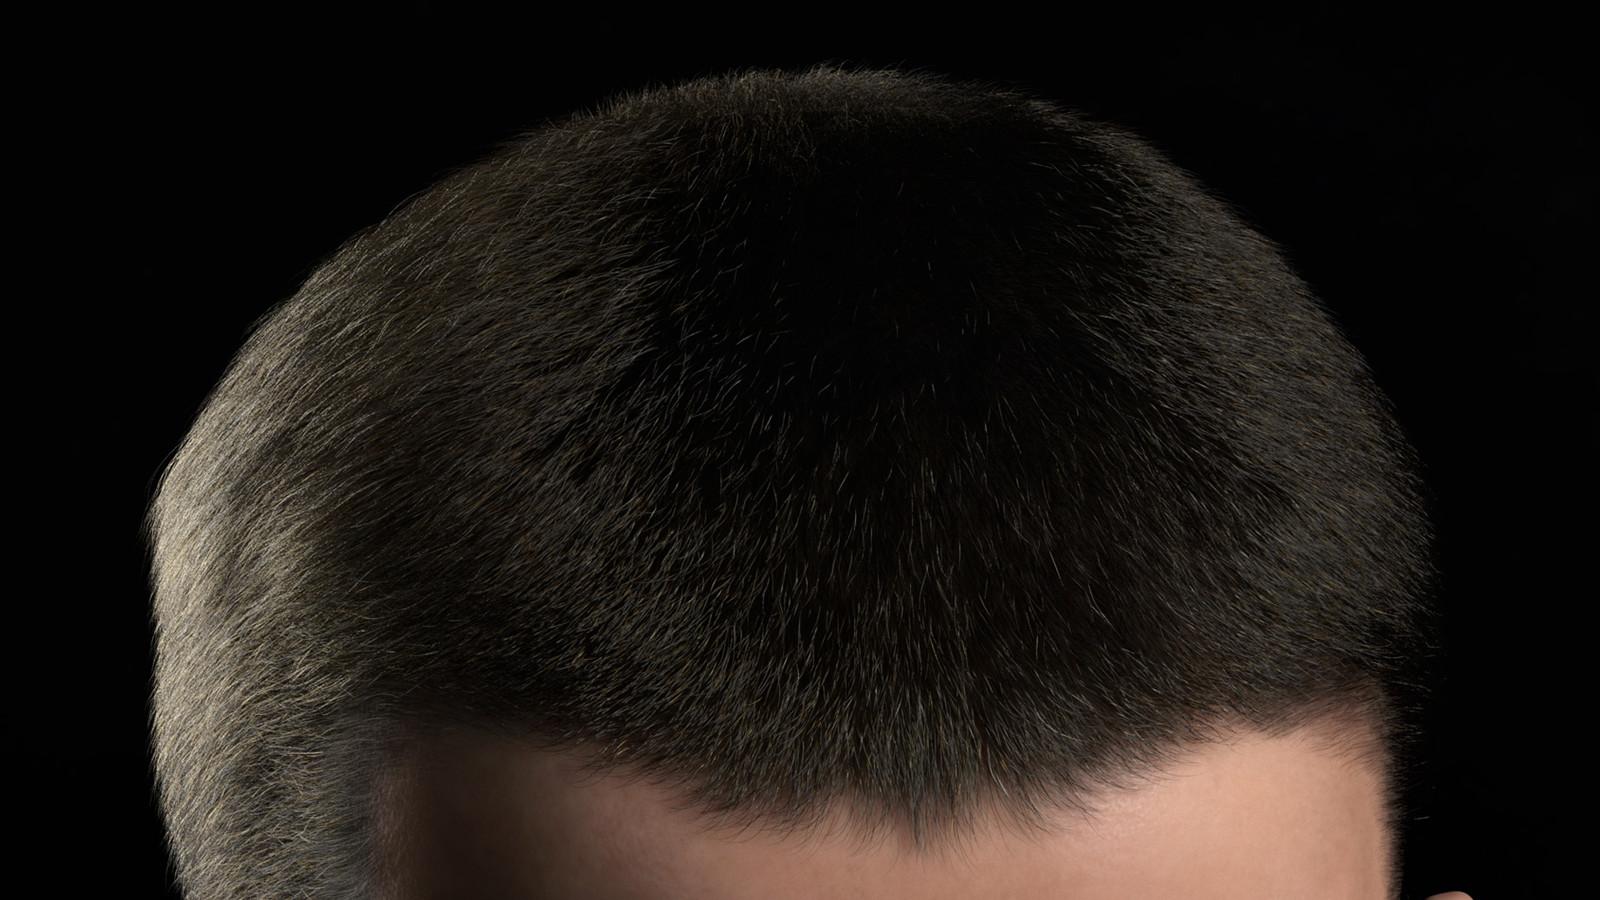 hair detail